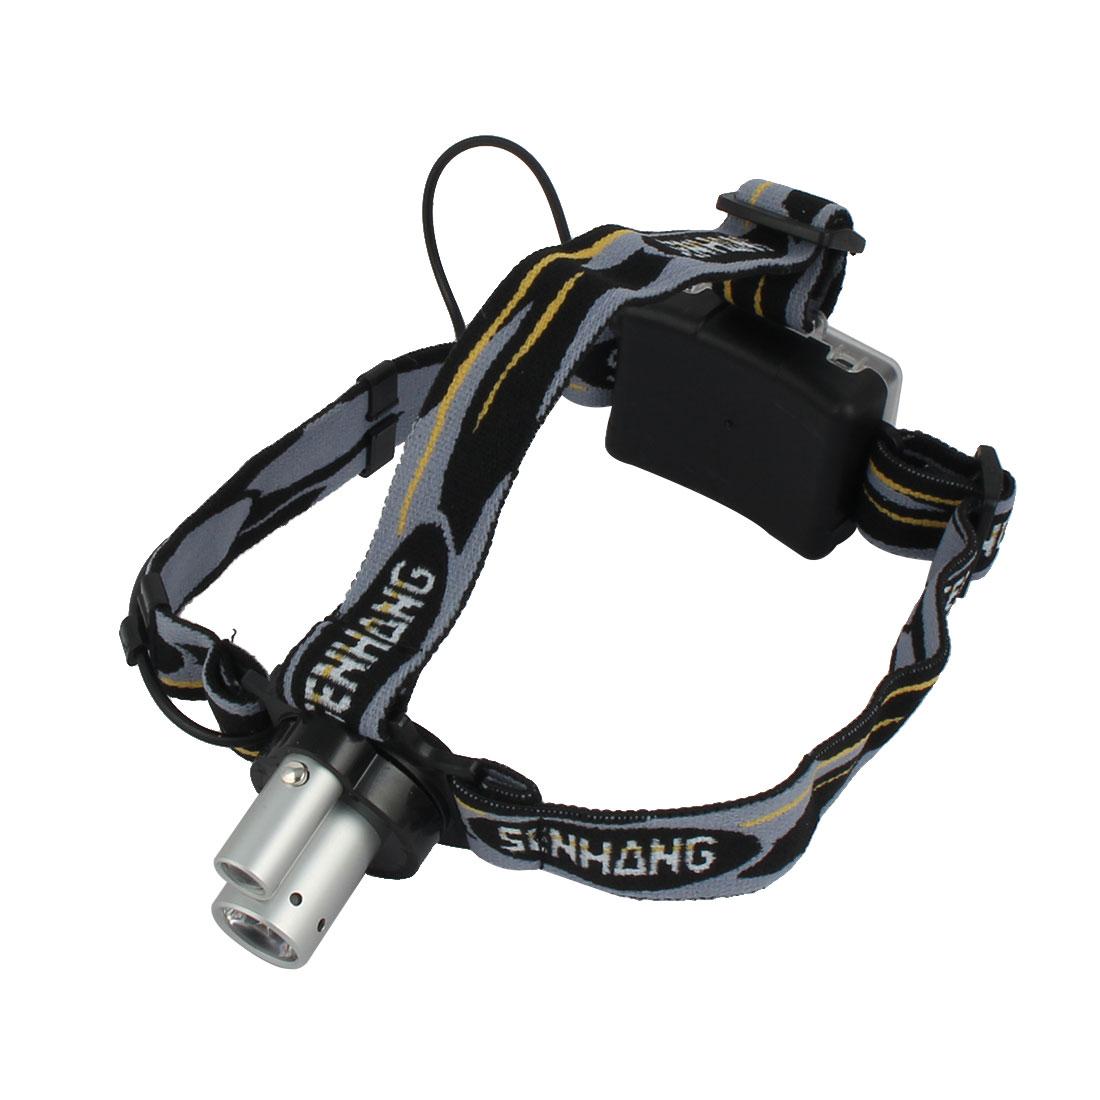 Zoomable Light Outdoor Biking Camping Hiking Dual Lighting Source Head Lamp LED Headlamp